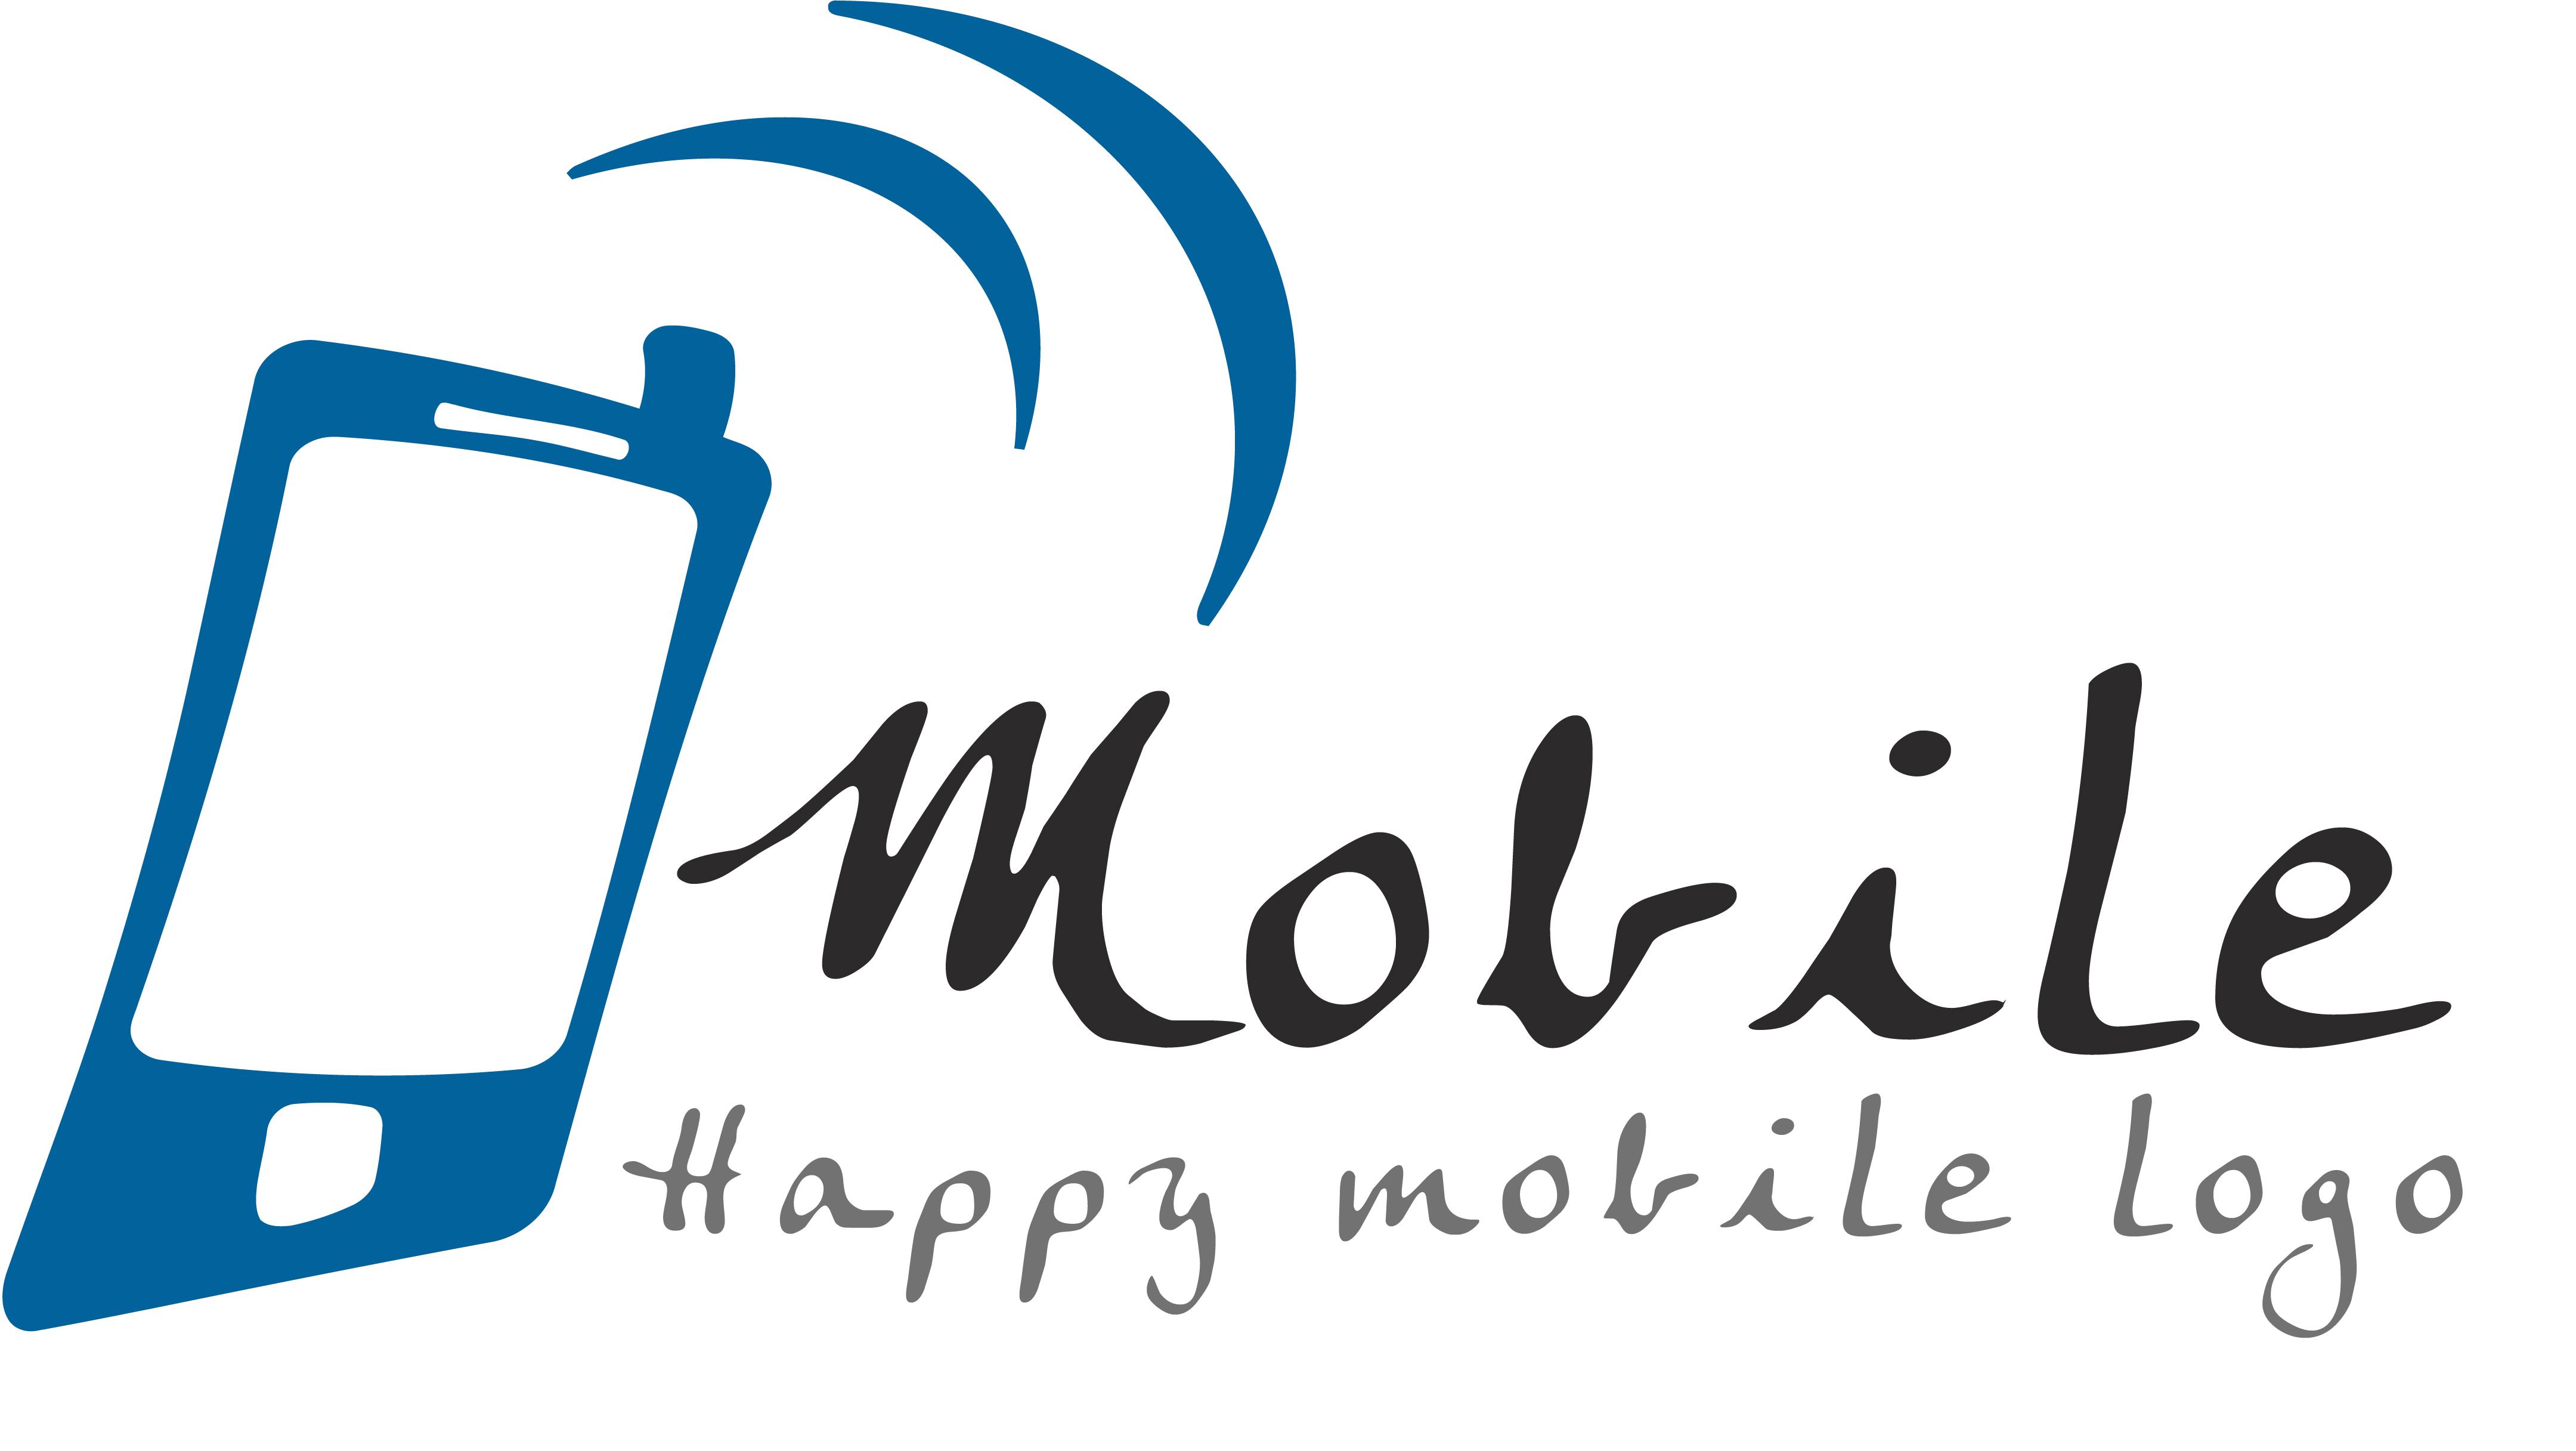 Mobile logos for Logo mobile